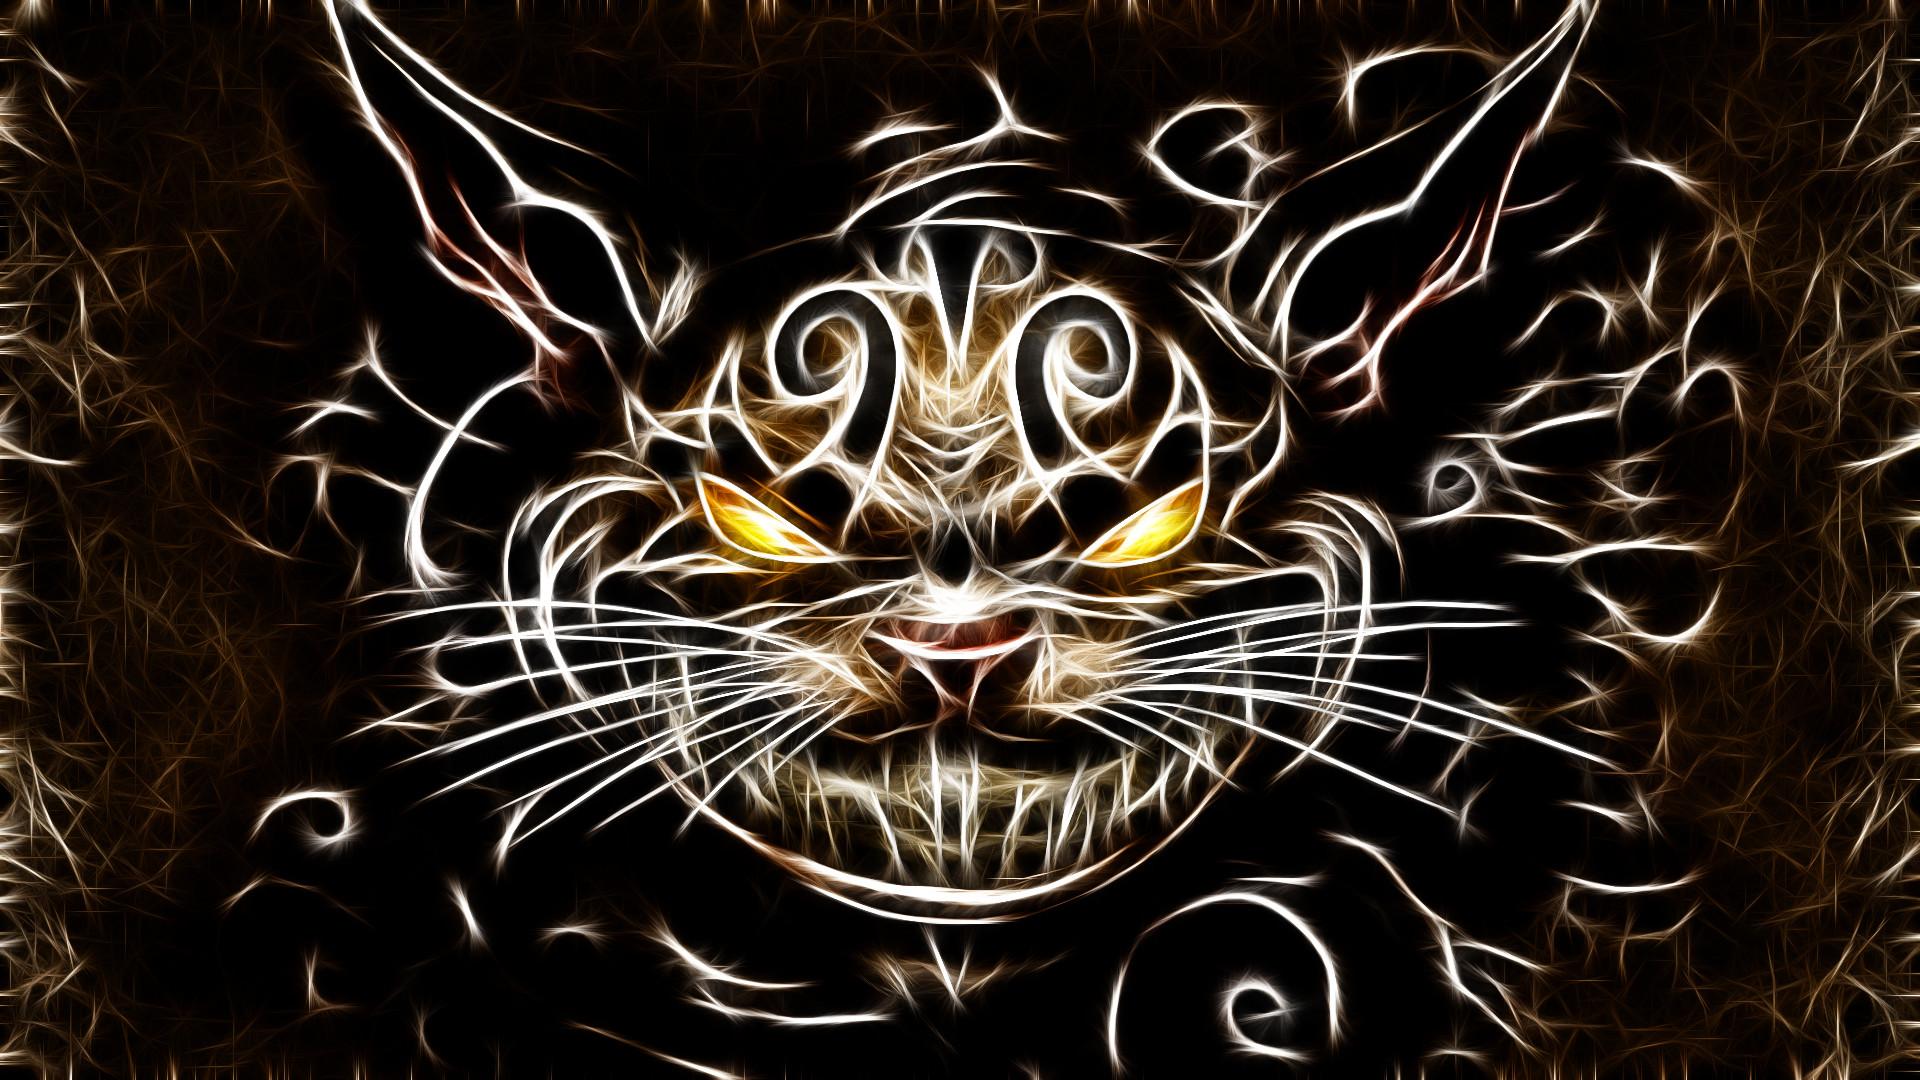 Image – Cats fractalius cheshire cat american mcgees alice desktop  hd-wallpaper-1197515.jpg   Creepypasta Wiki   FANDOM powered by  Wikia